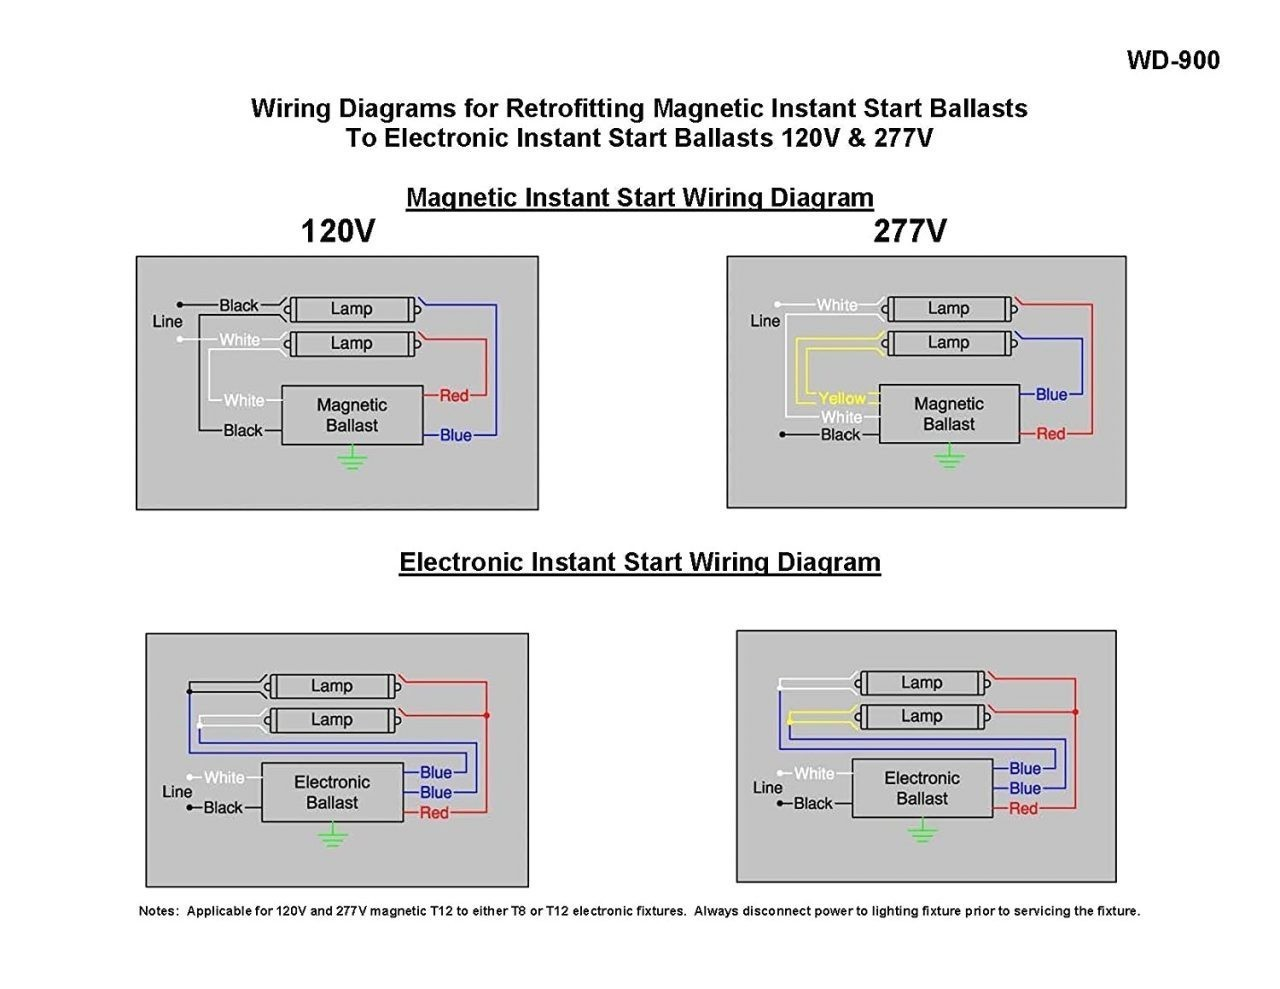 ge proline t8 ballast wiring diagram best of awesome 2 lamp t8 ballast wiring diagram 10 3 of ge proline t8 ballast wiring diagram